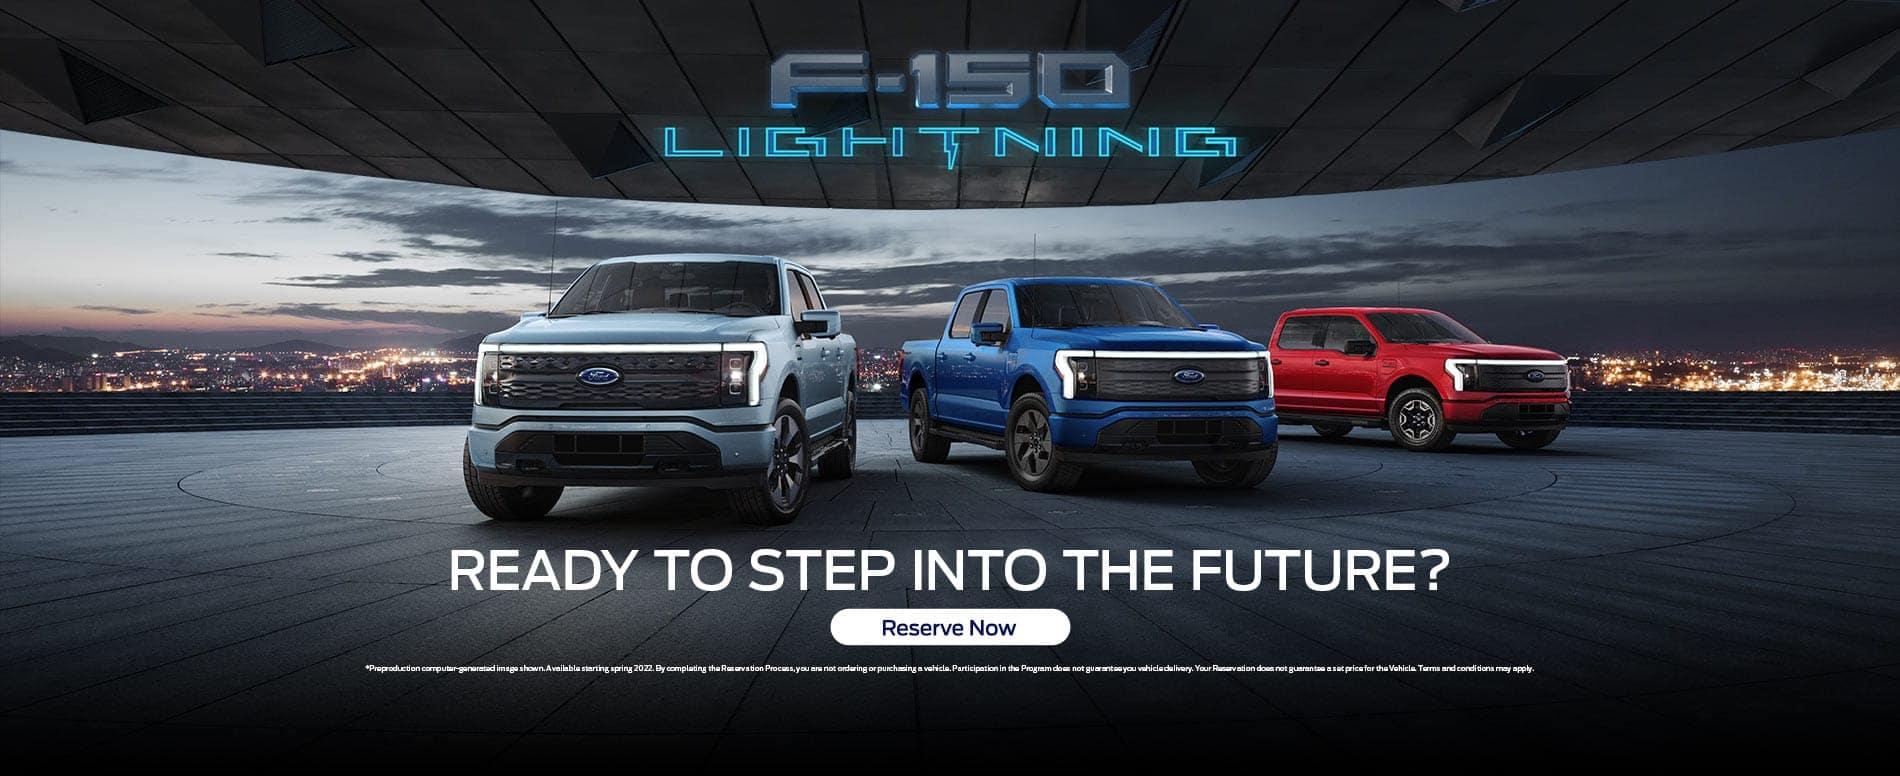 4 Ford-Sep21-F150-Lightning-Banner-1900x776